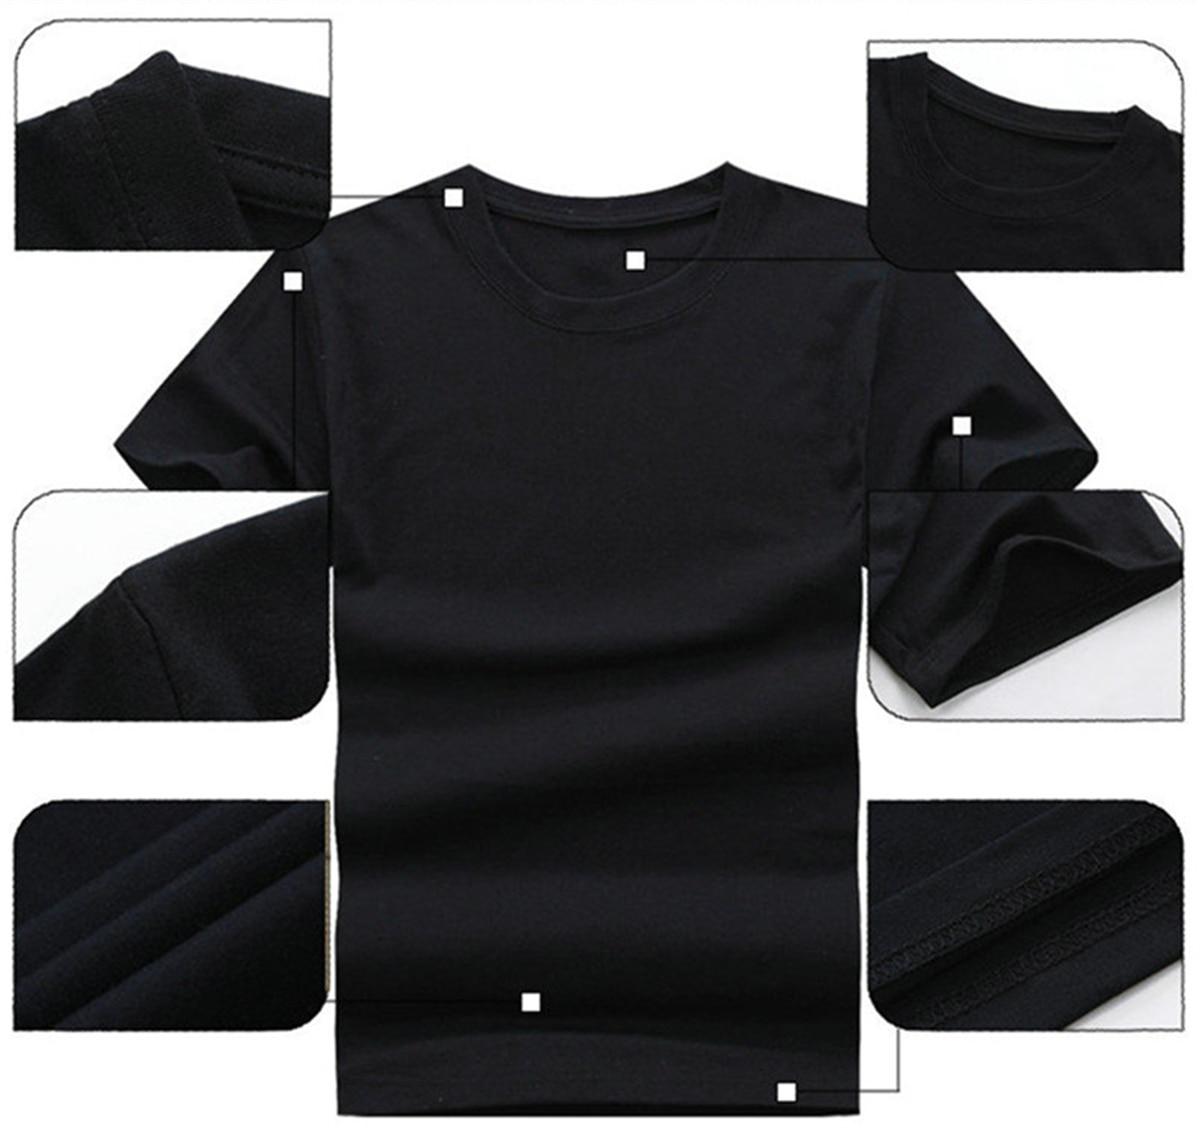 GILDAN Aim Here. Ultimate Frisbee Shirt Womens T-shirt